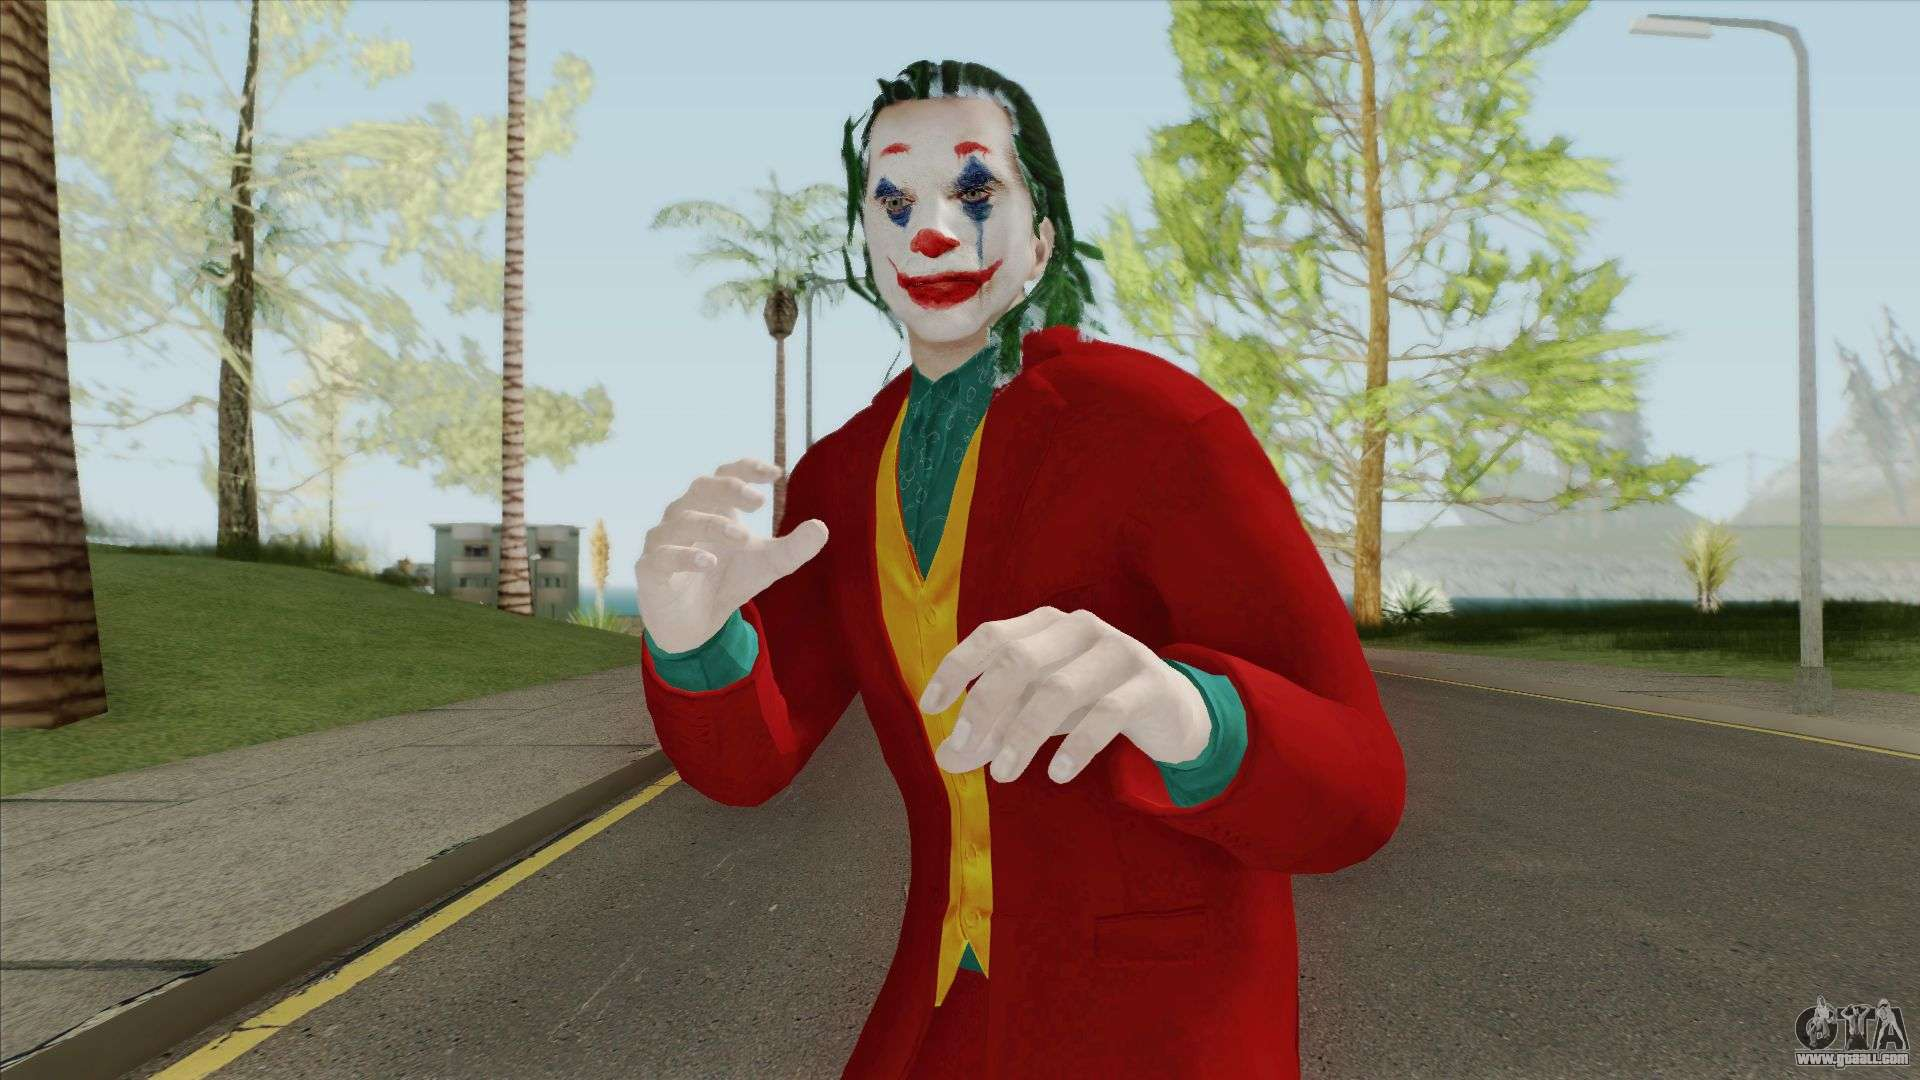 Joker 1989 (Jack Nicholson Skin) for GTA San Andreas